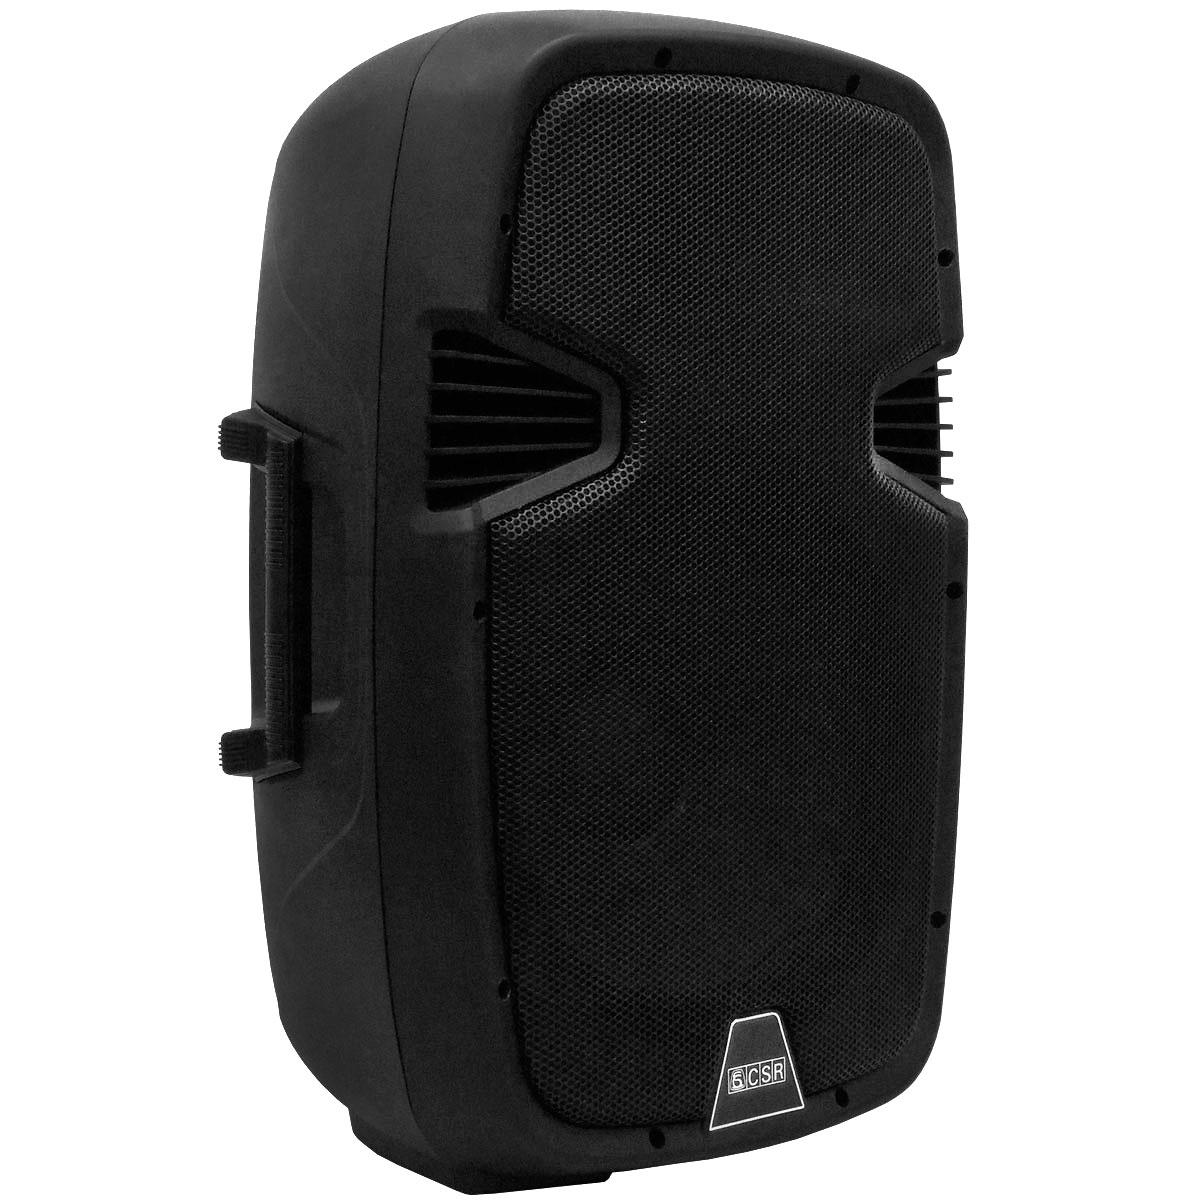 Caixa Passiva Fal 12 Pol 200W - CSR 5512